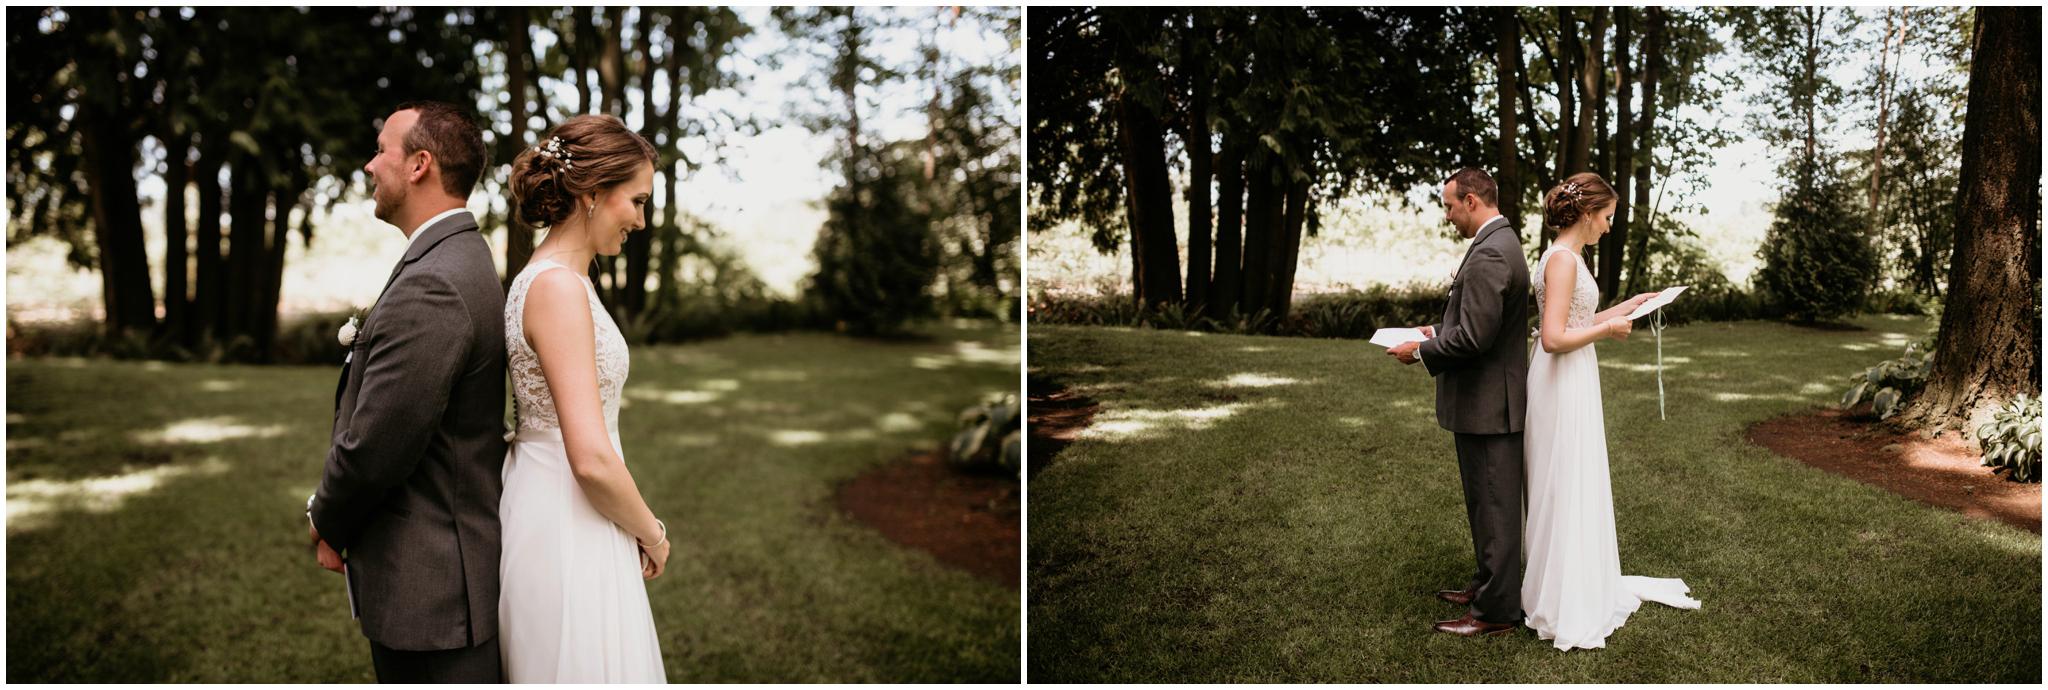 erin-and-tyler-evergreen-gardens-bellingham-wedding-photographer-024.jpg